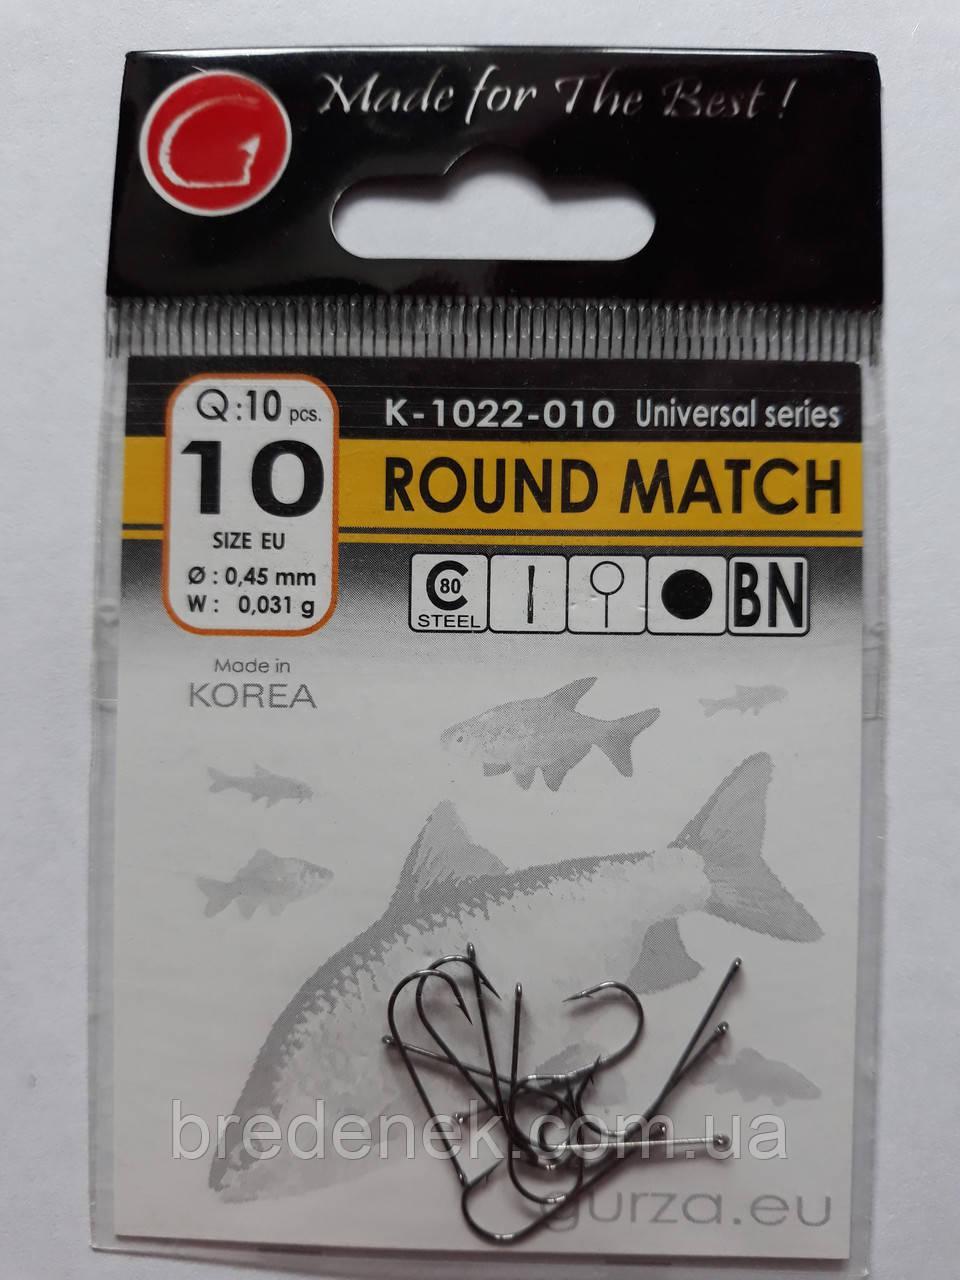 Гачки Gurza round match № 10